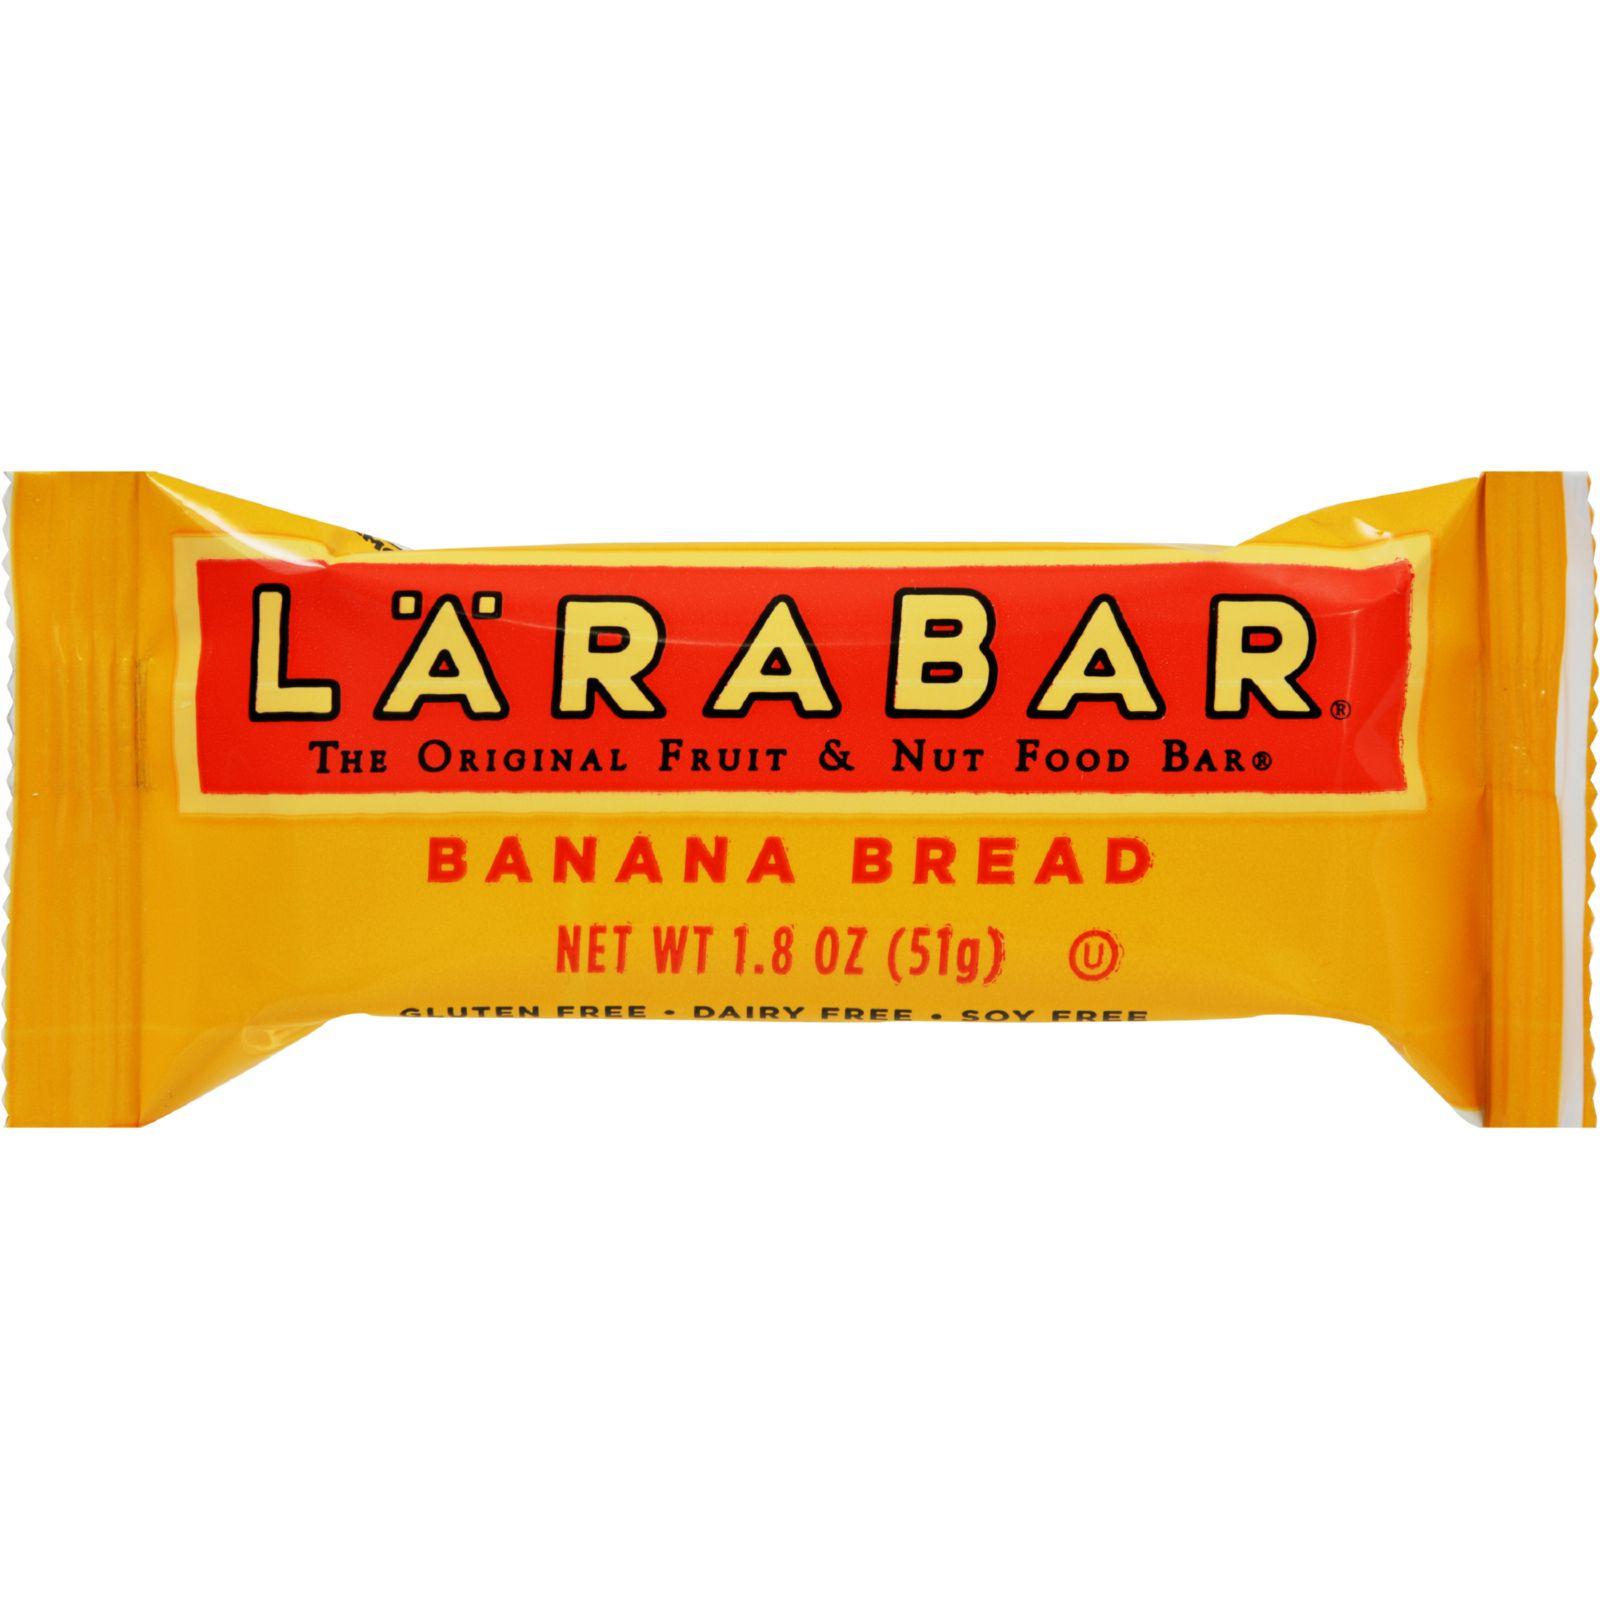 Larabar - Original Fruit And Nut Bar - Bnna Brd S210698-7 - Case Of 16 - 1.8 Oz.